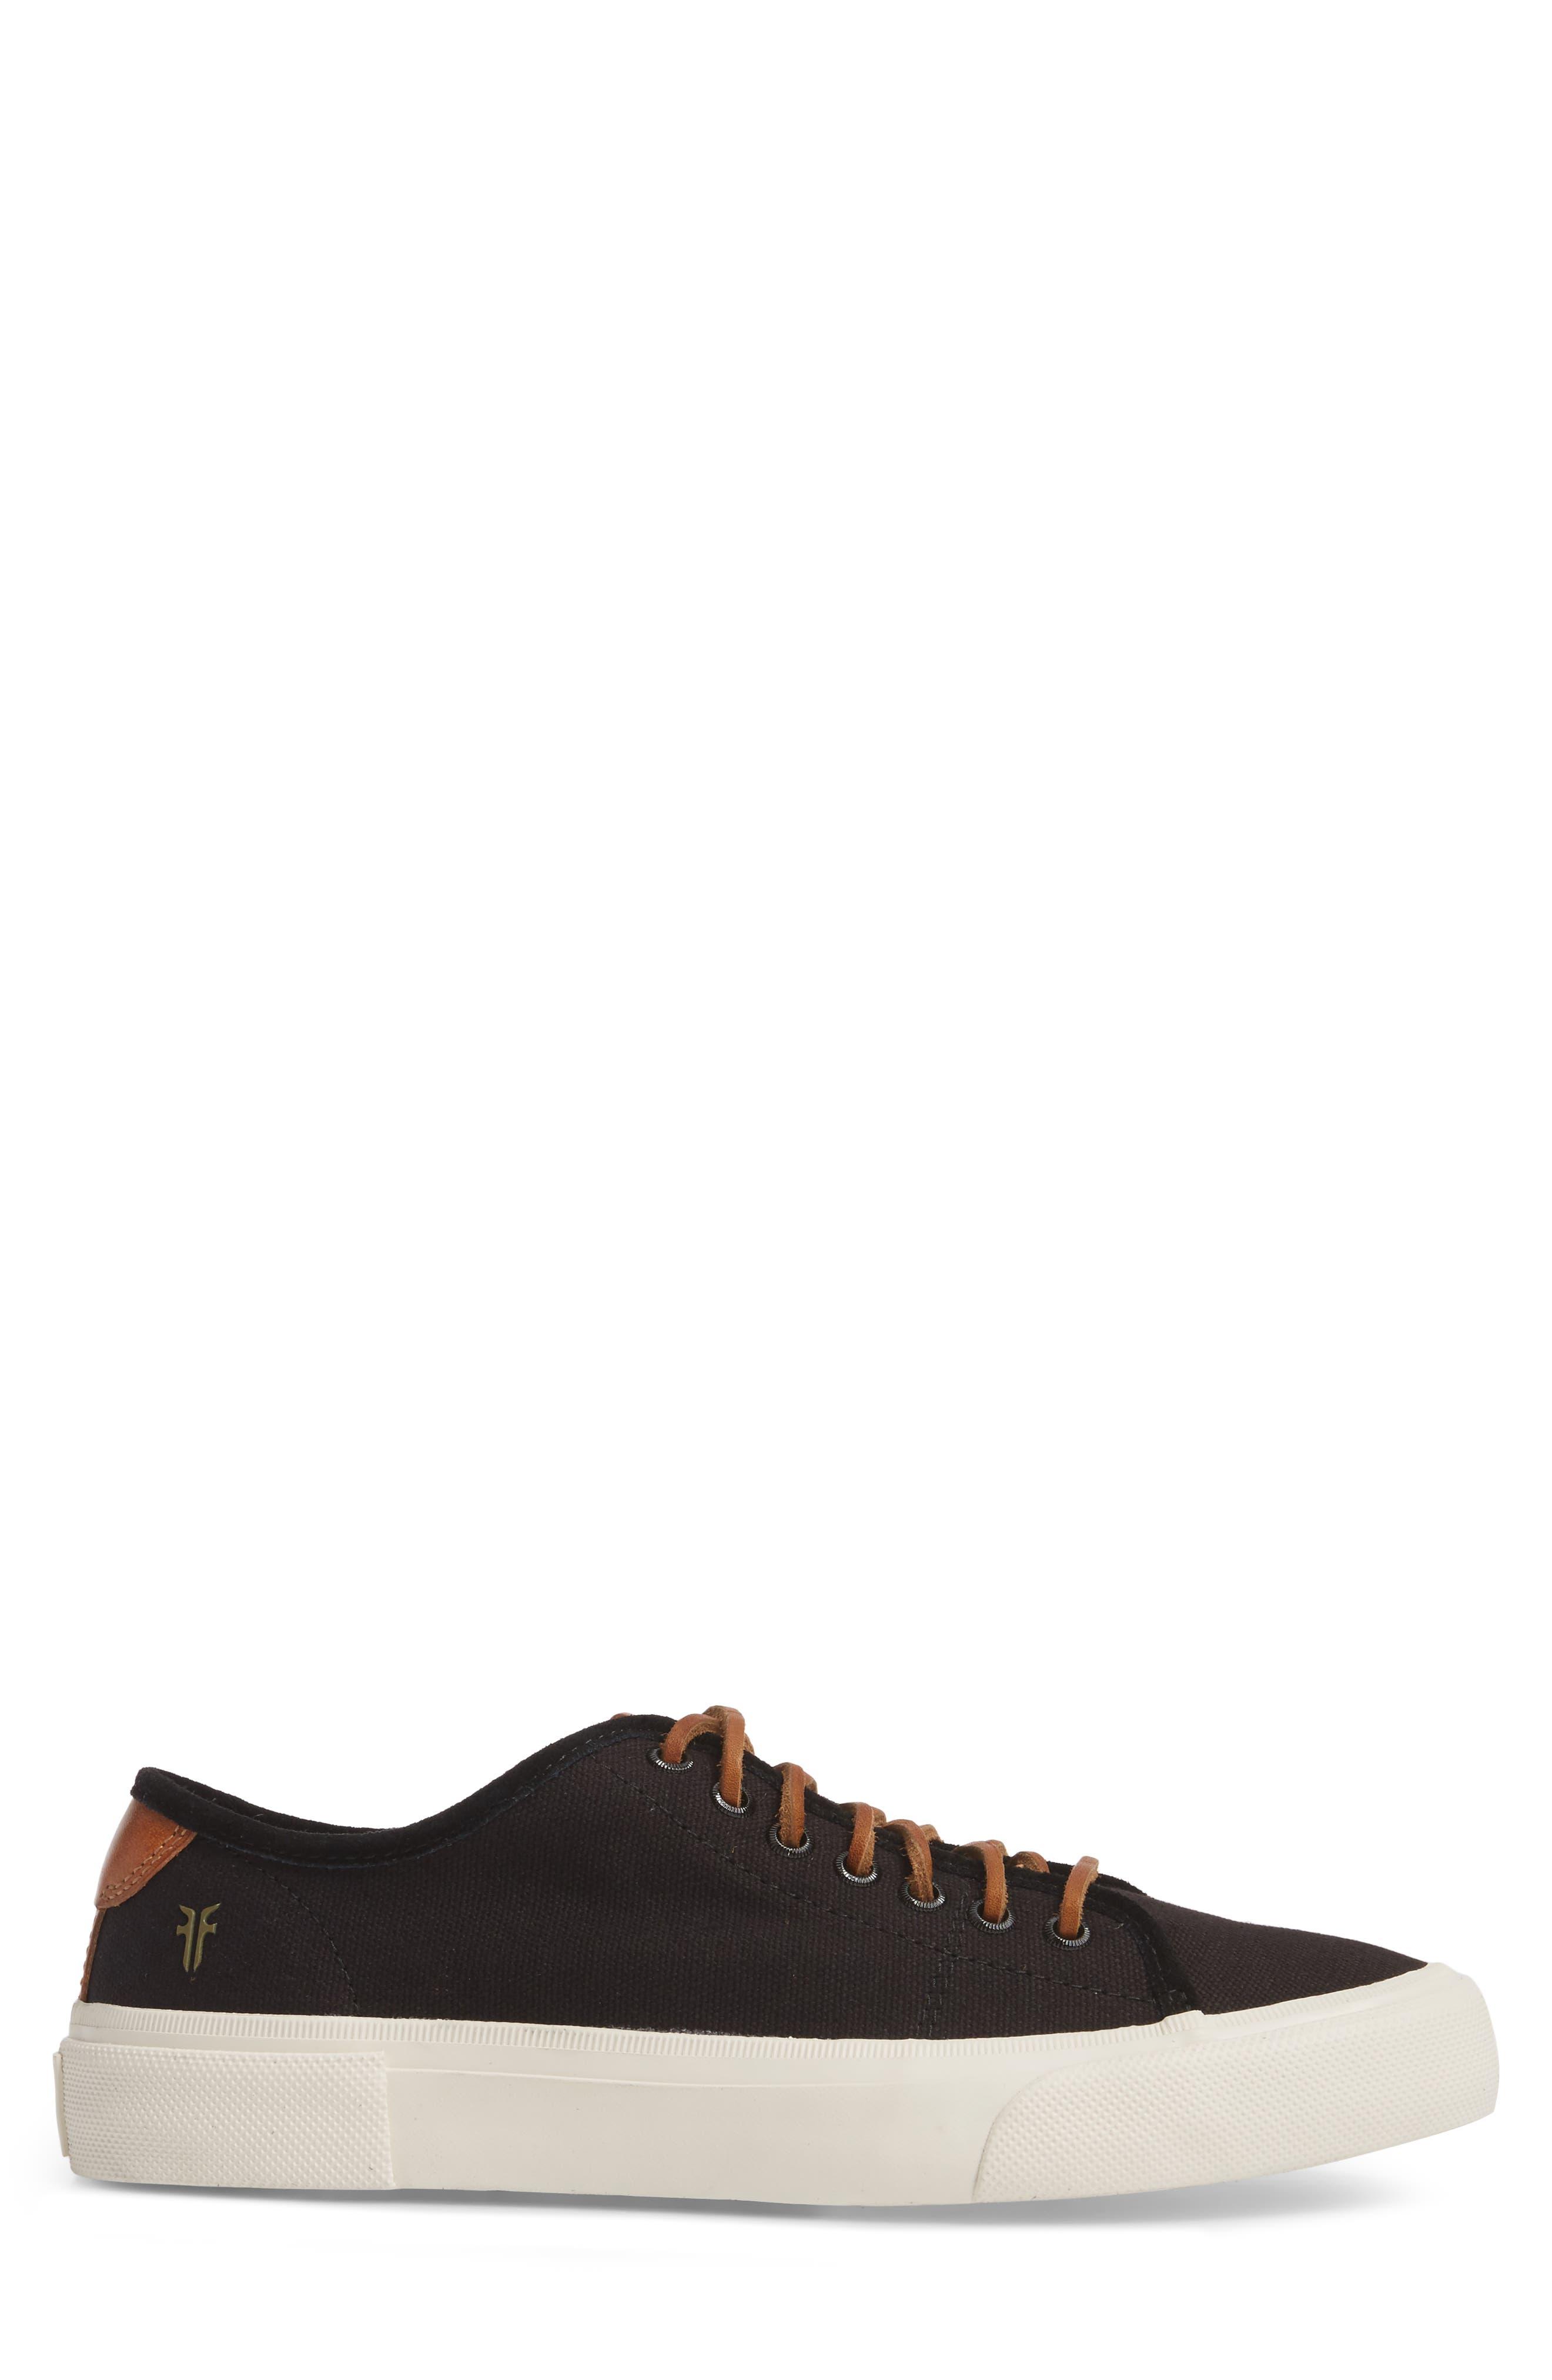 Ludlow Low Top Sneaker,                             Alternate thumbnail 3, color,                             001